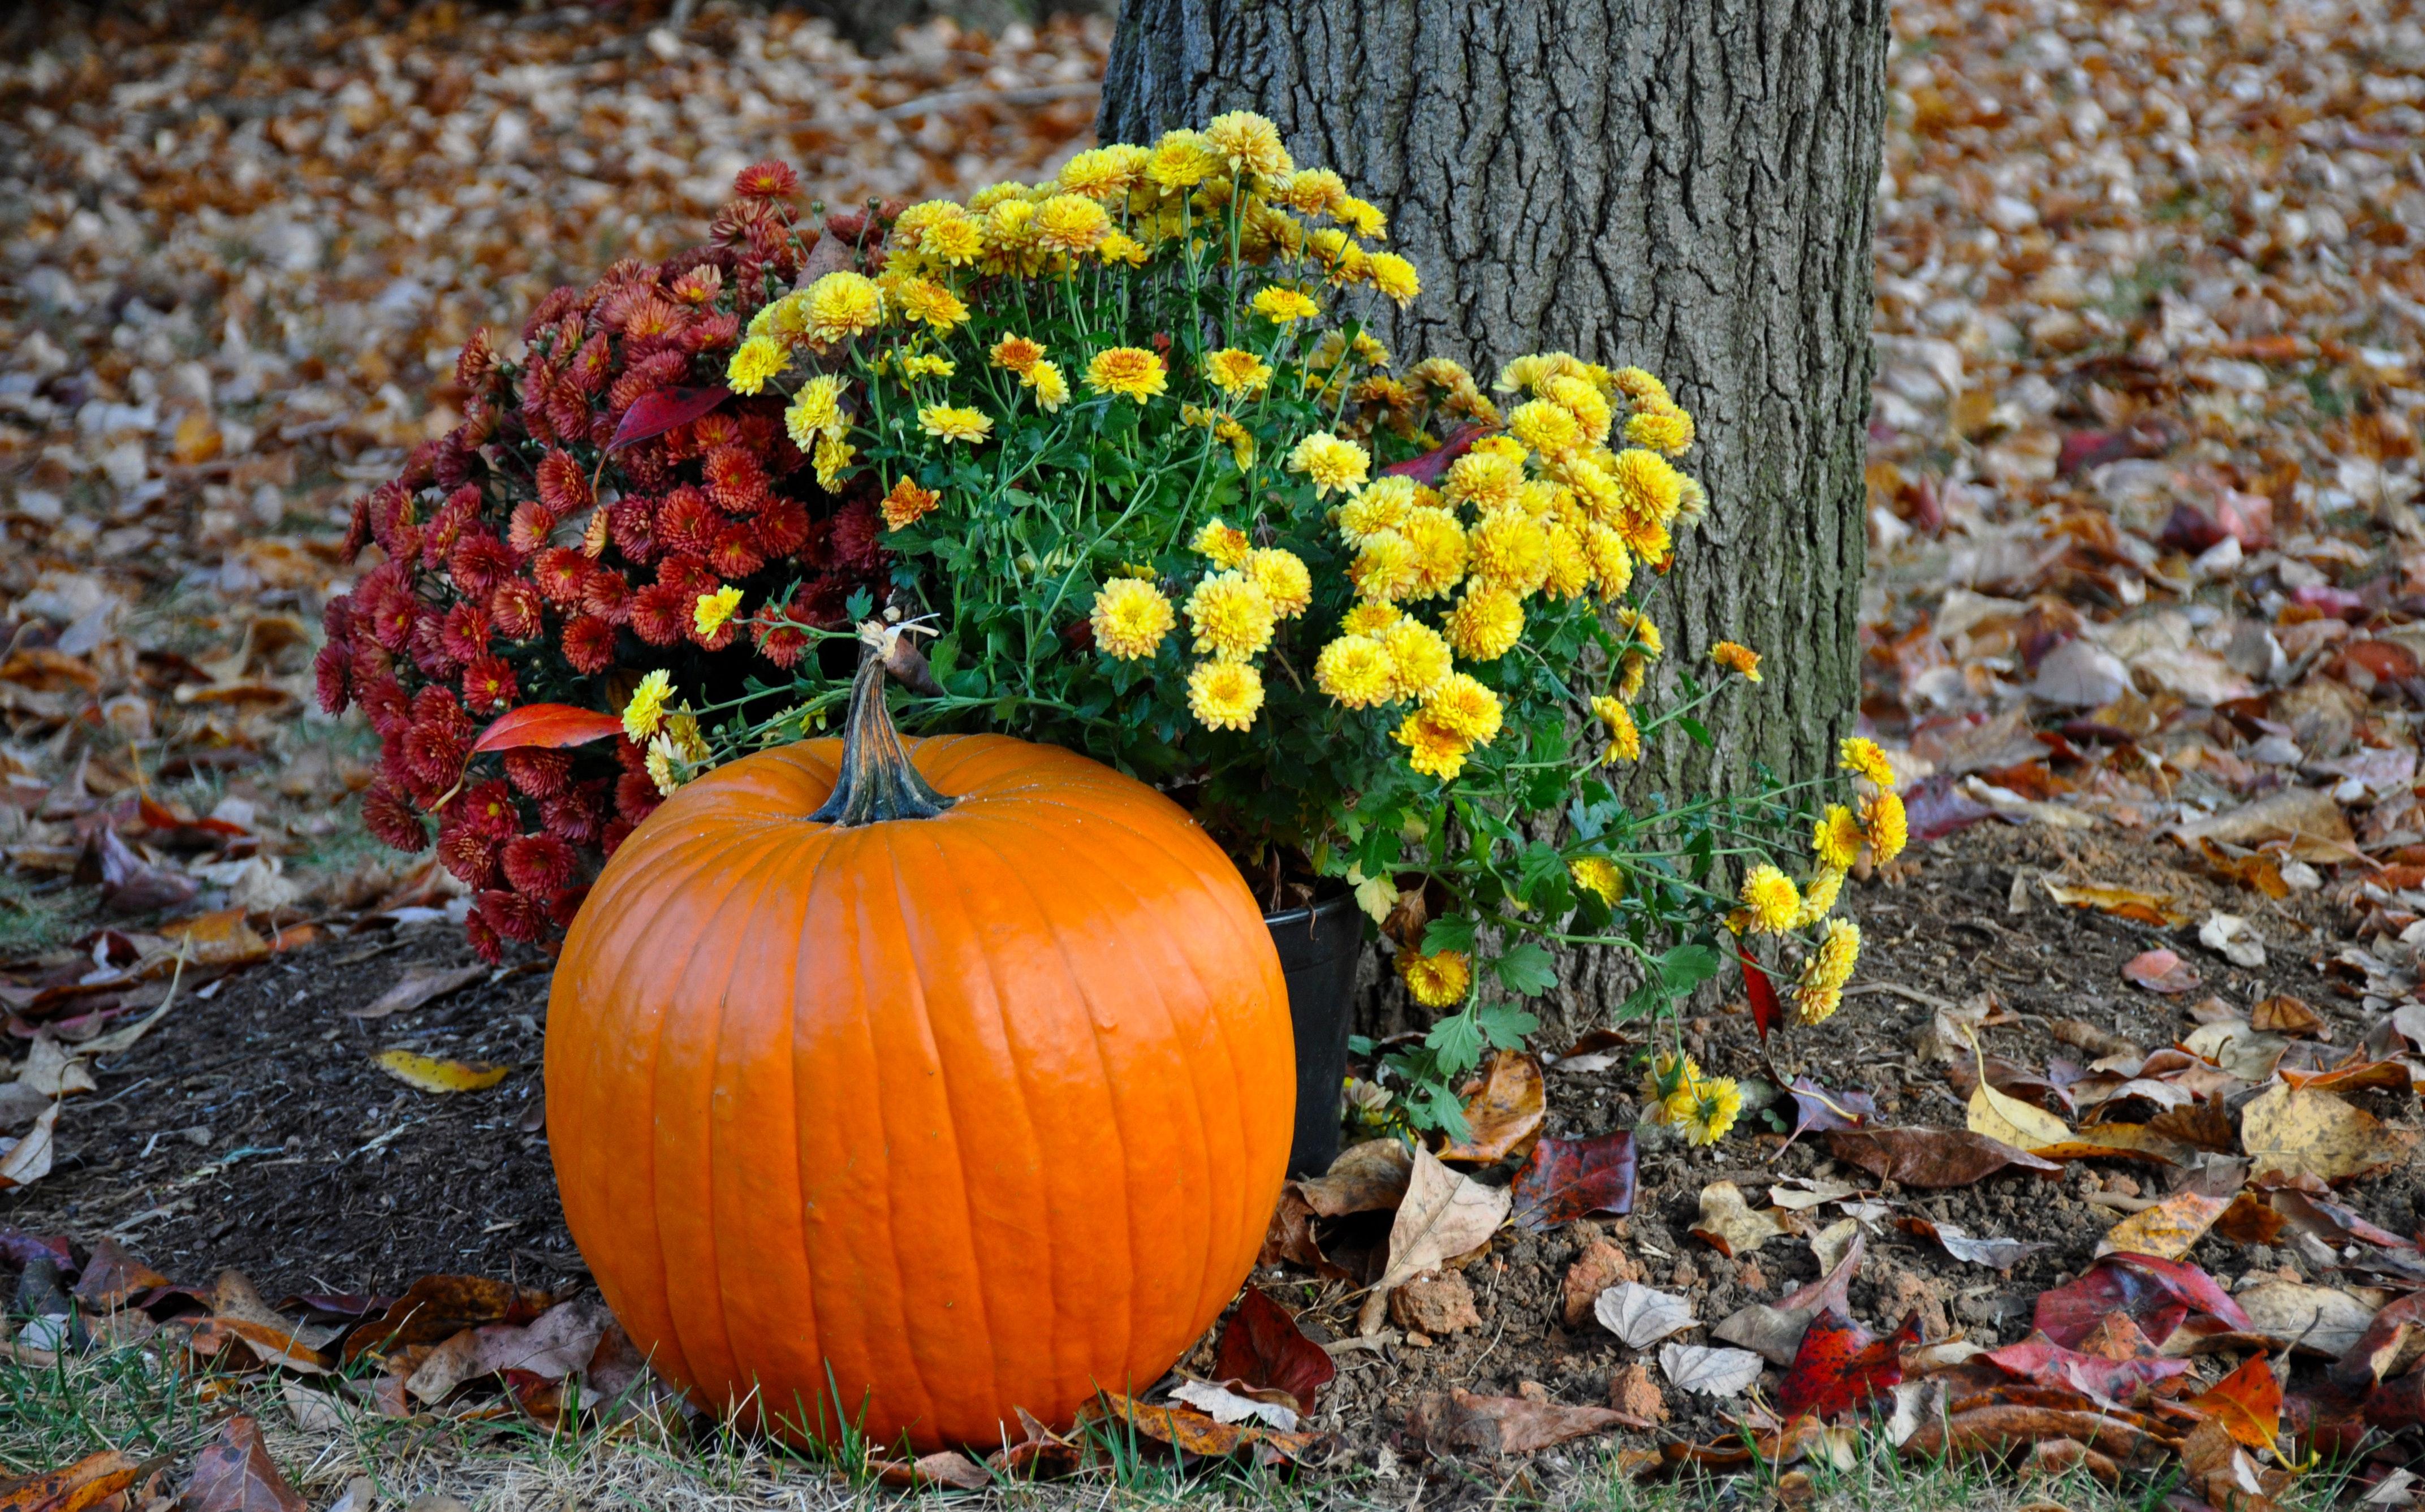 Pumpkin near tree photo